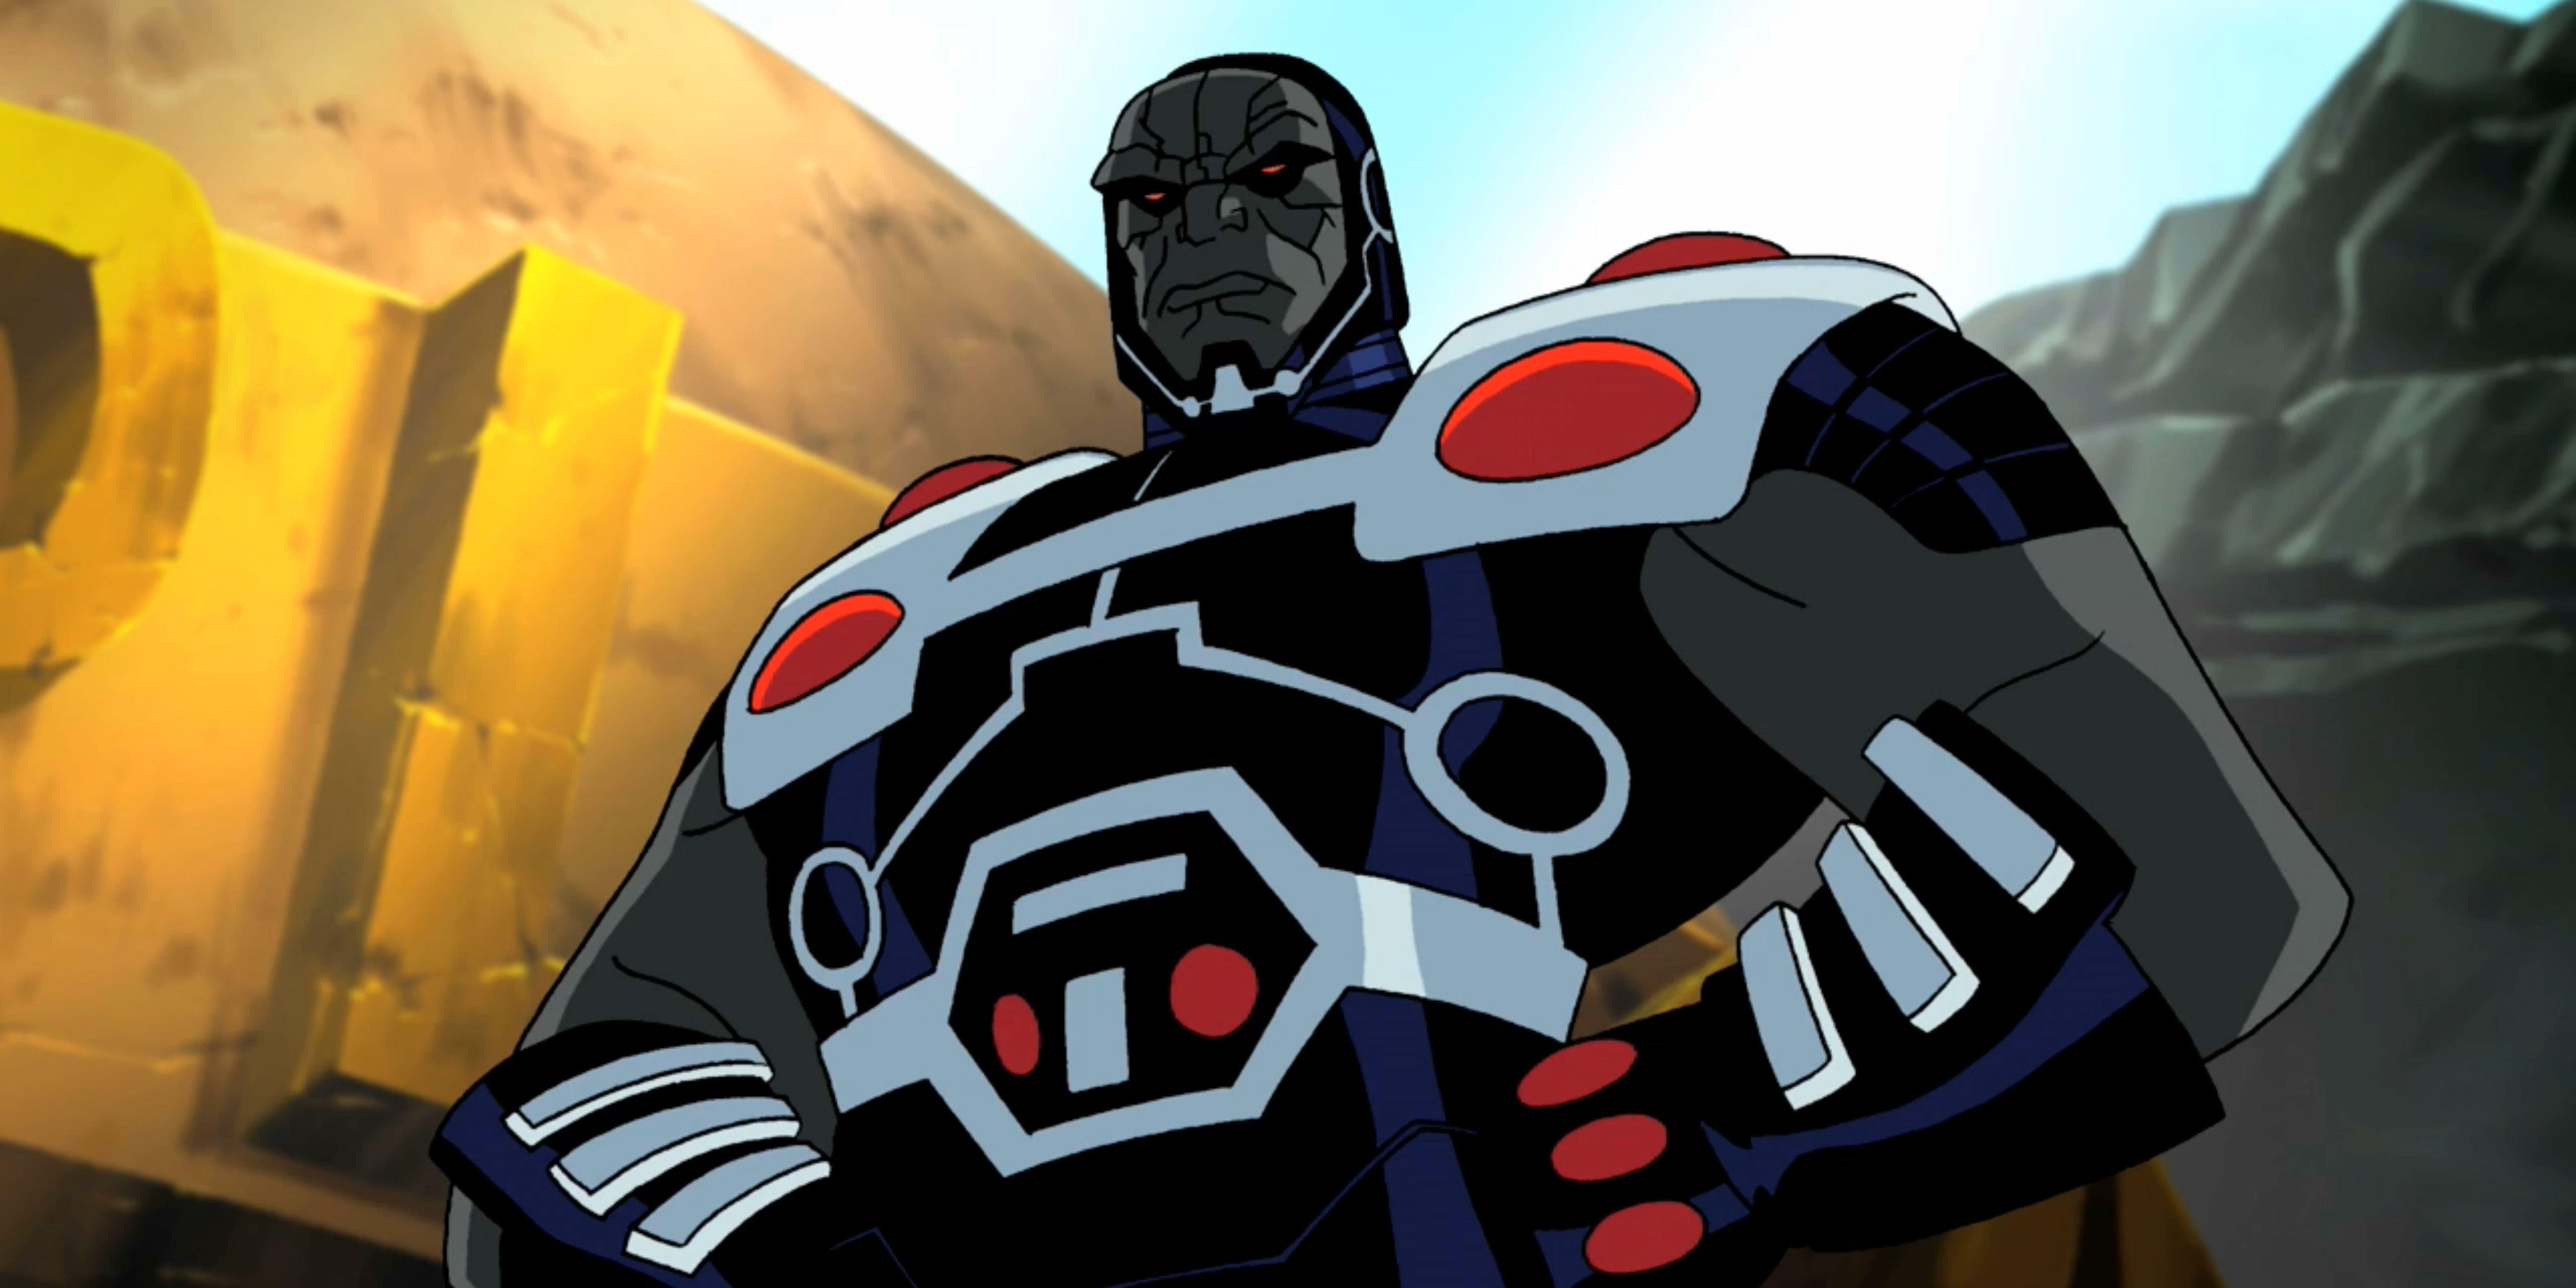 Darkseid stands menacing over Earth.